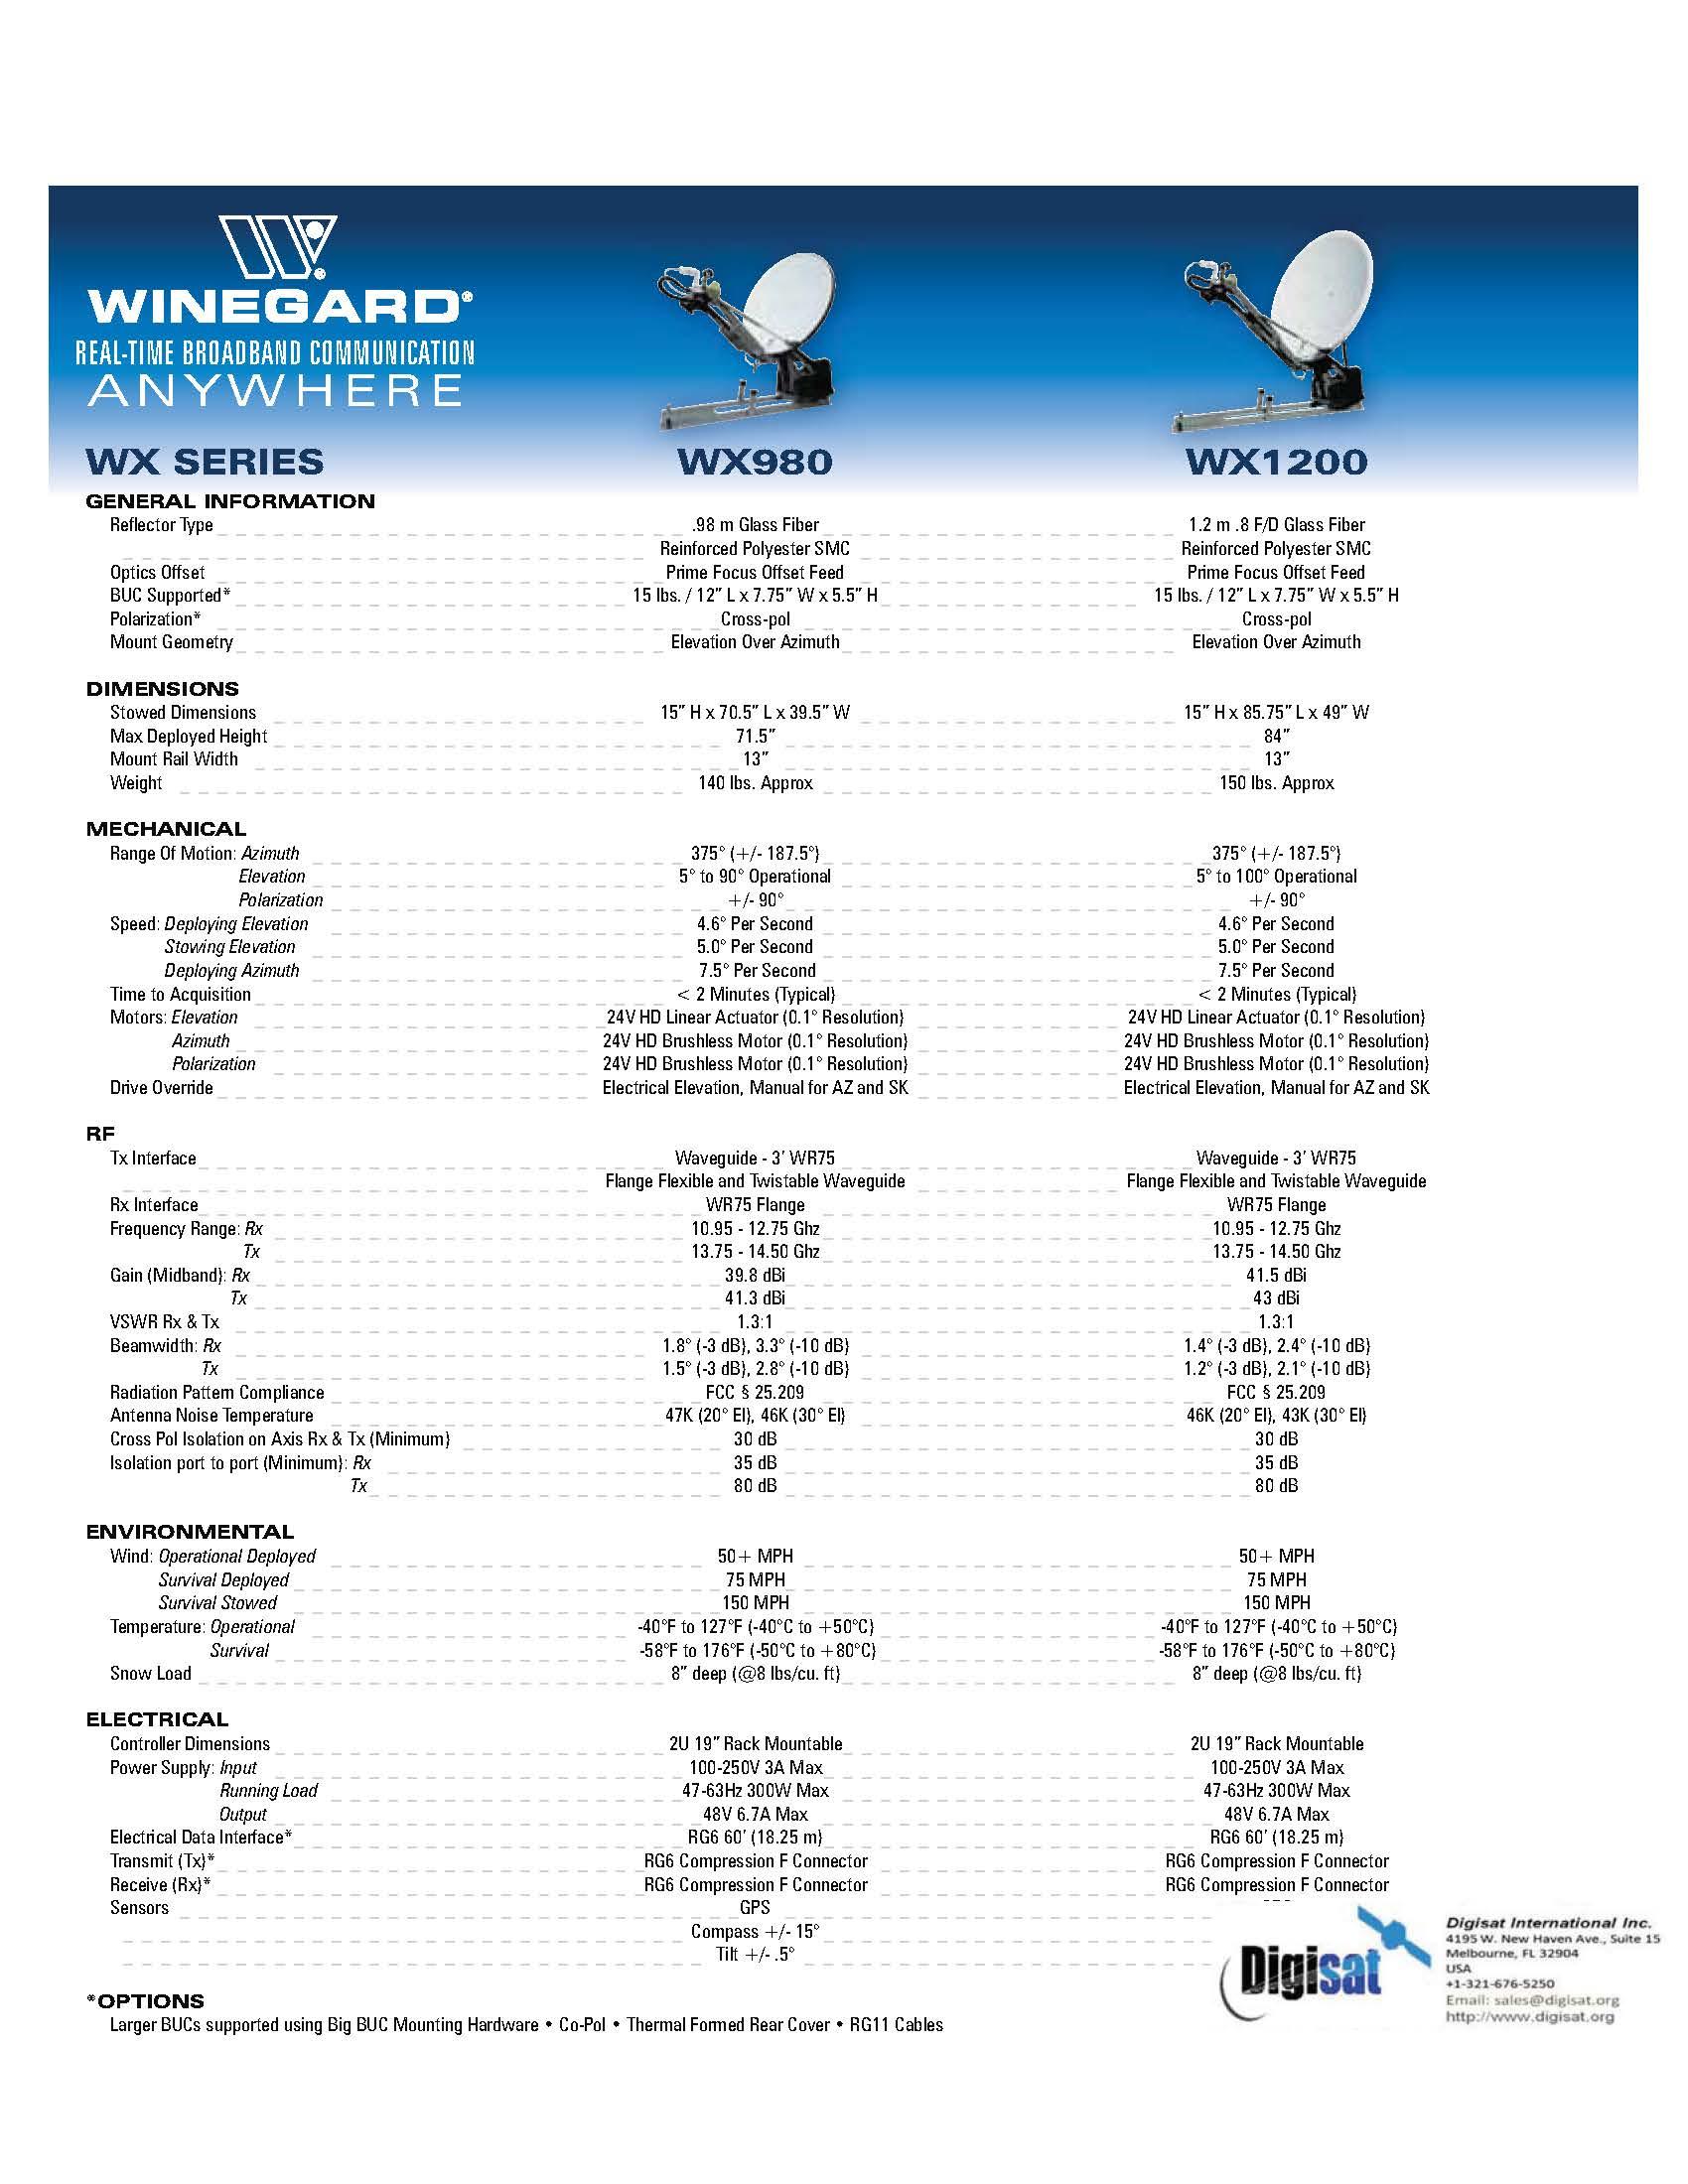 Winegard WX980 tech specs